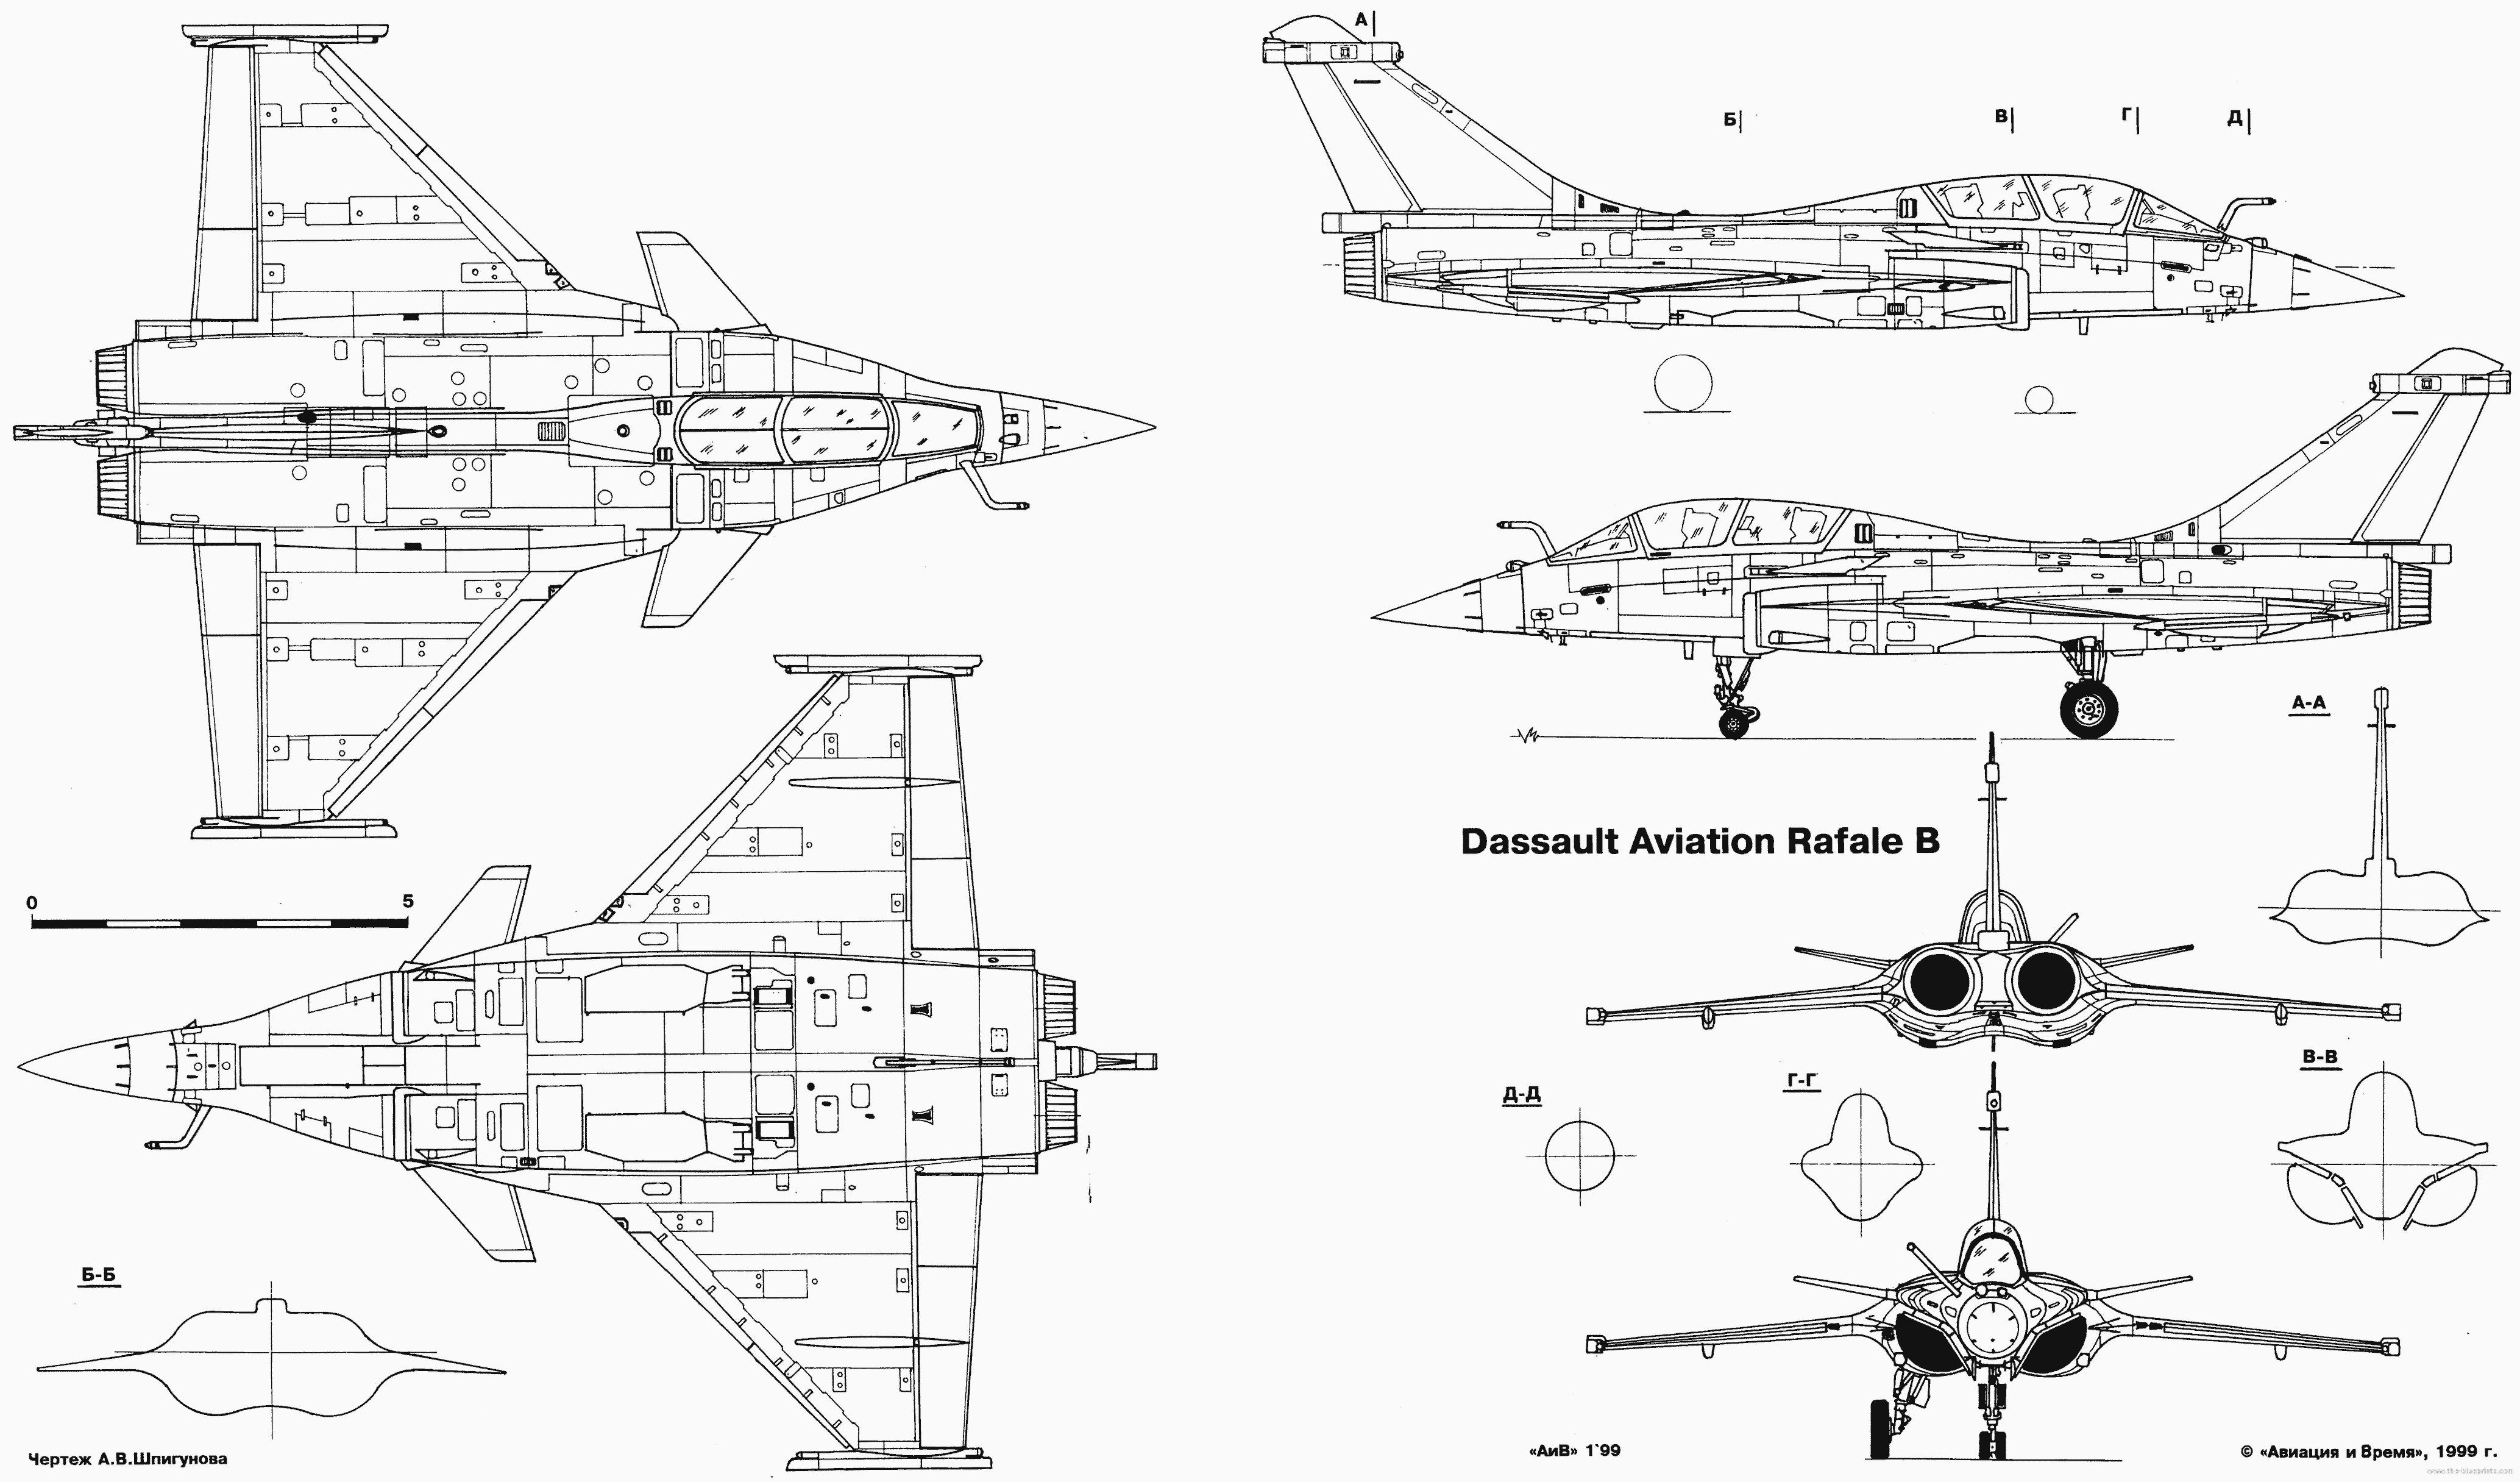 Dassault Rafale B blueprints free - Outlines